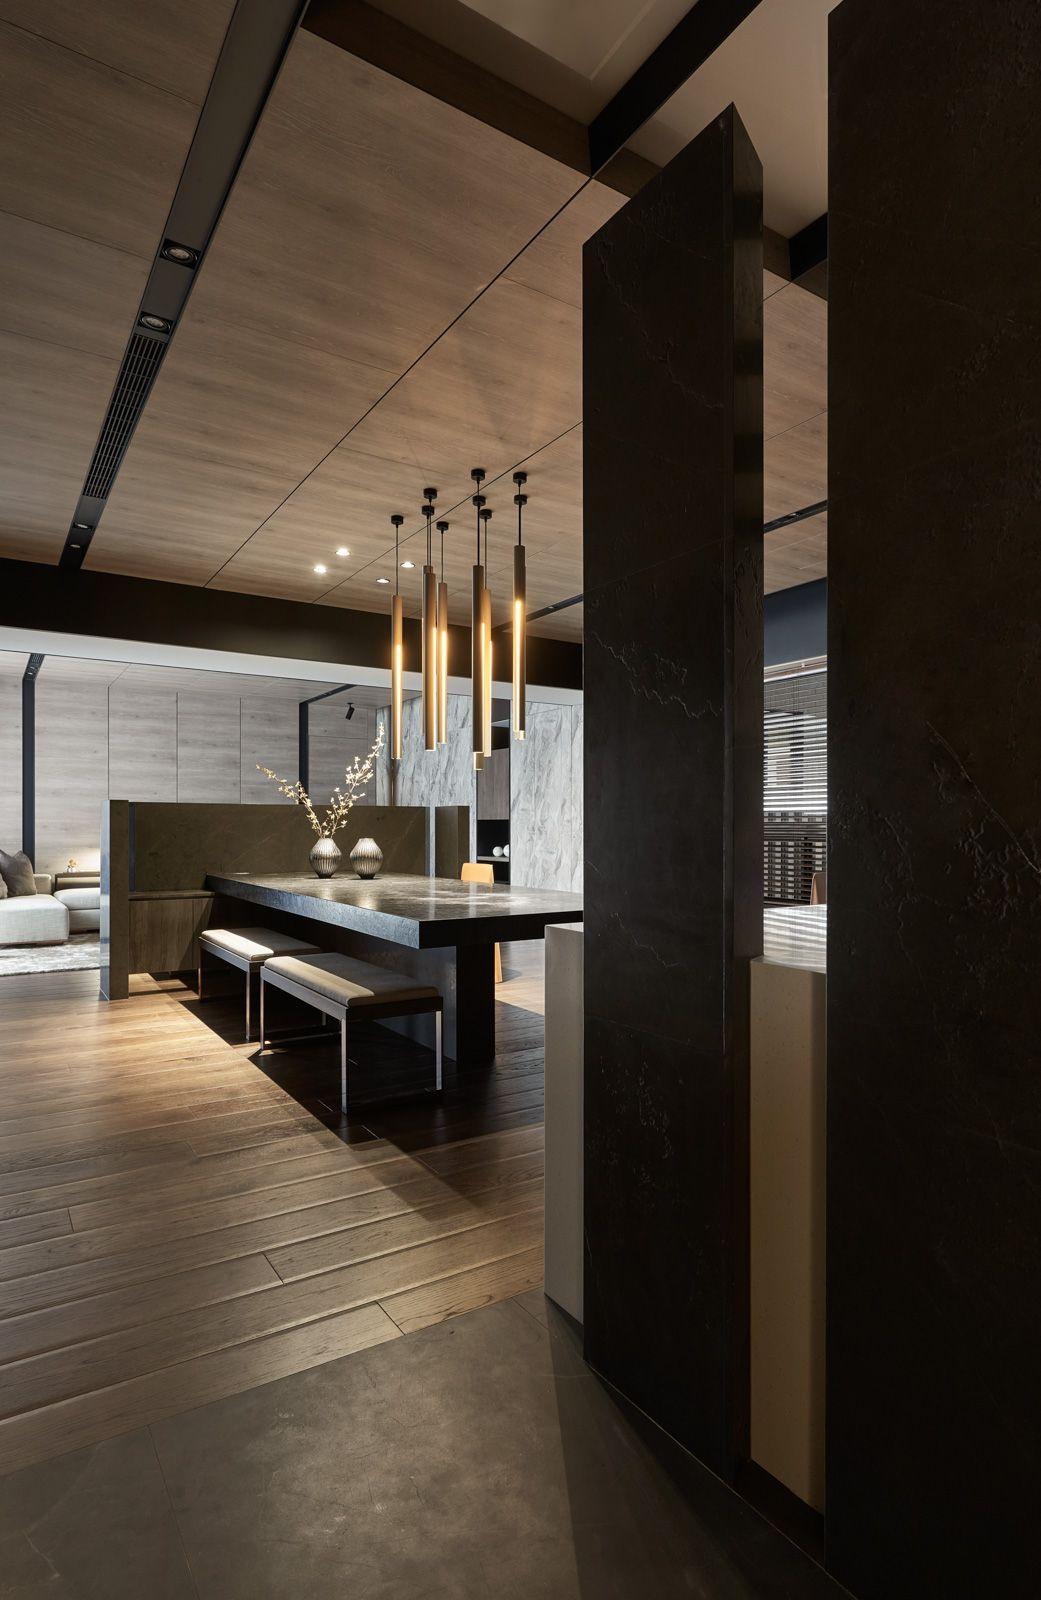 Oneworkdesign Flow迴留 Flow 材料的感受本案為住宅空間 利用延伸